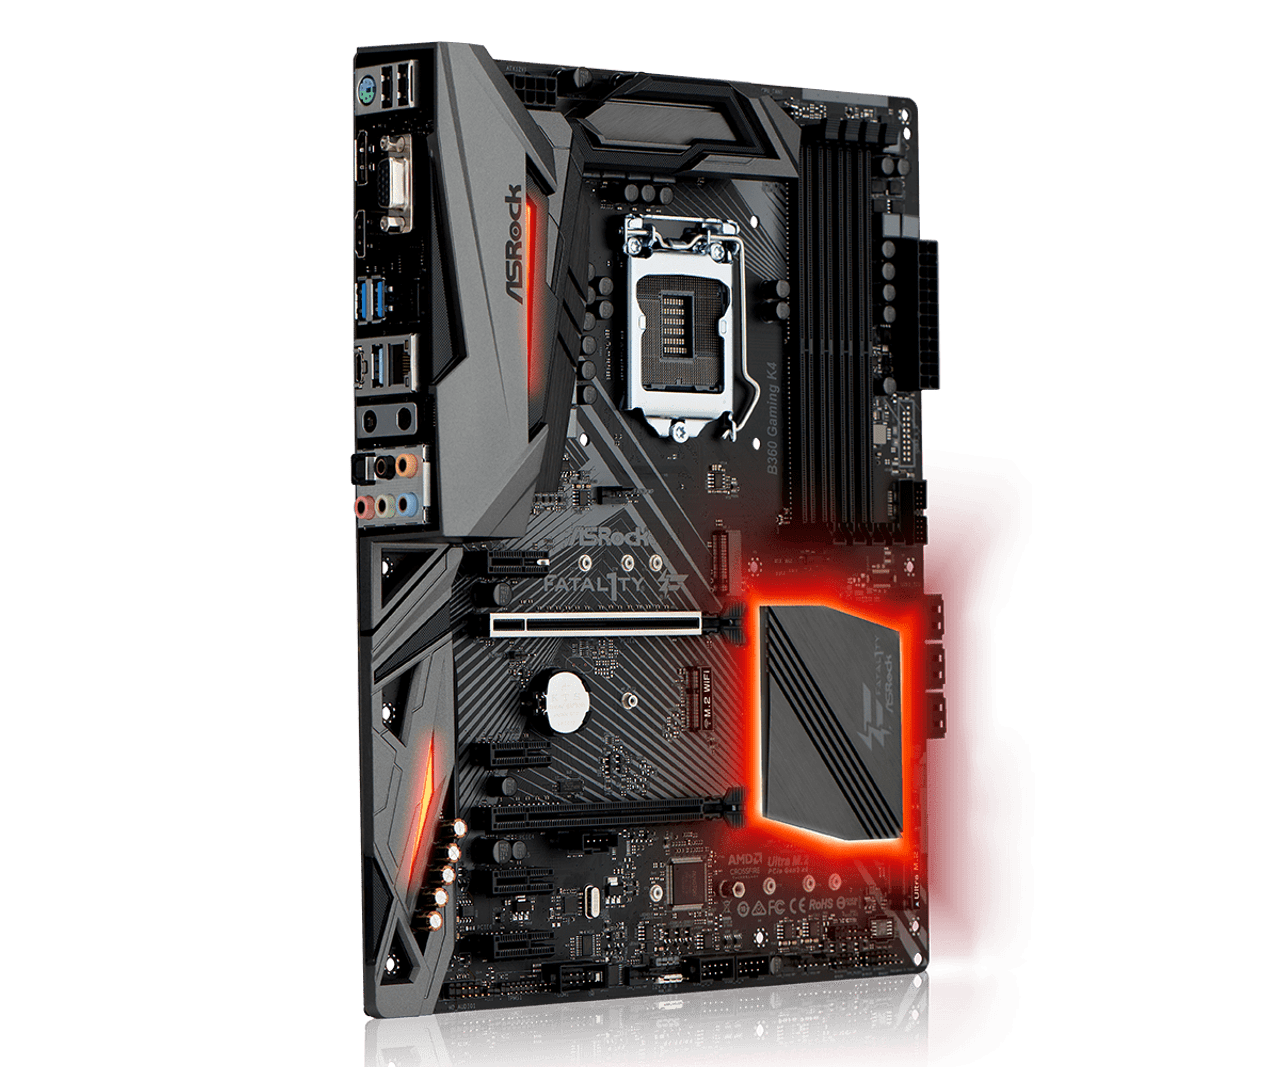 ASRock Fatal1ty B360 Gaming K4, ATX, PCIe x16, CFX, M 2 (2 SSD, 1 WiFi Key  E), HDMI, DP, D-Sub, USB 3 1, Intel I219V, Thunderbolt 3, 3 yrs wrty